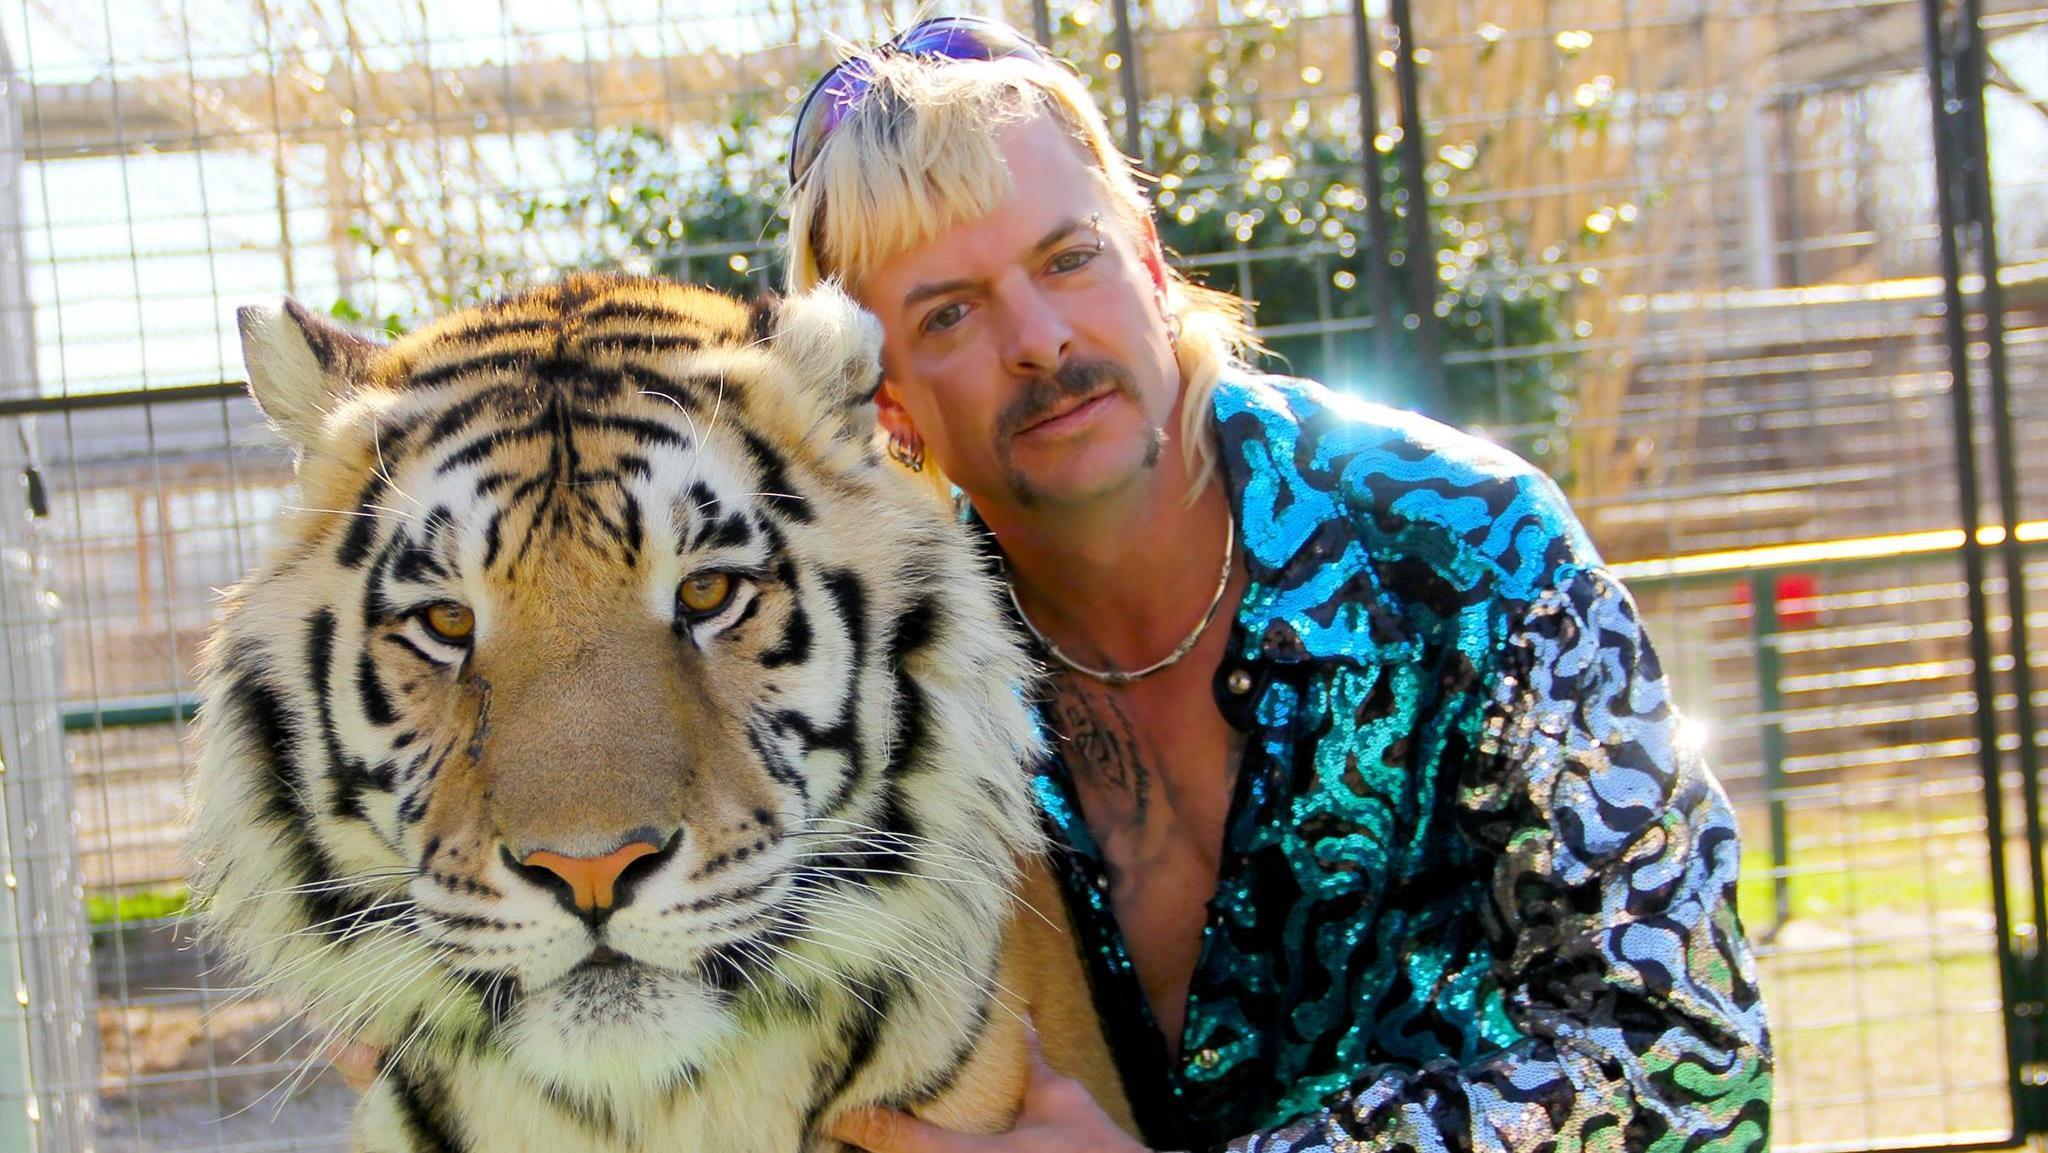 tiger_king.jpg